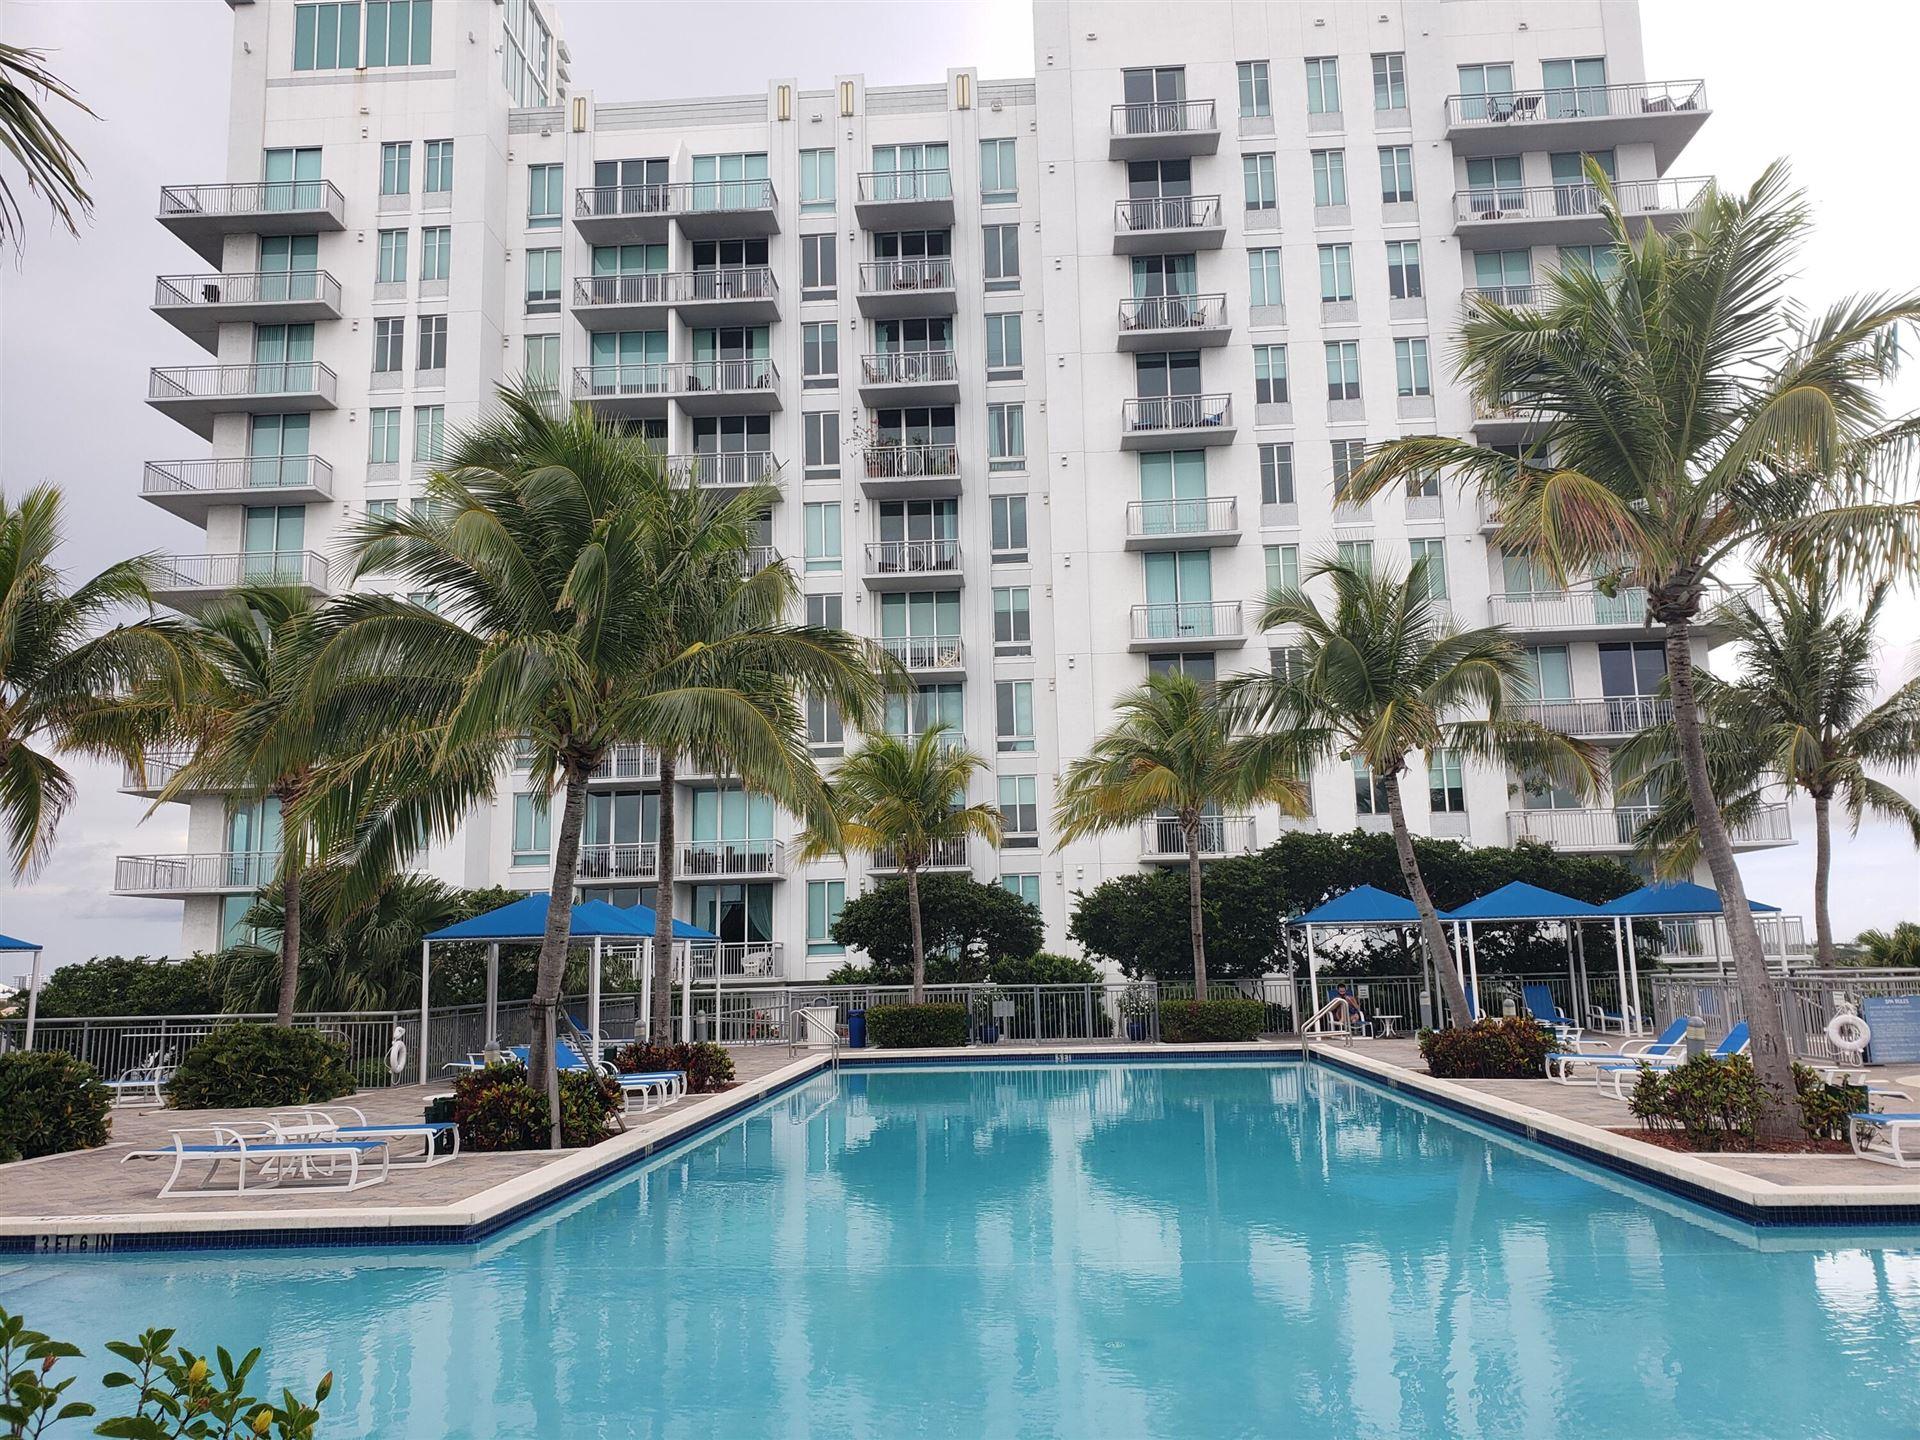 300 S Australian 818 Avenue #818, West Palm Beach, FL 33401 - MLS#: RX-10751968